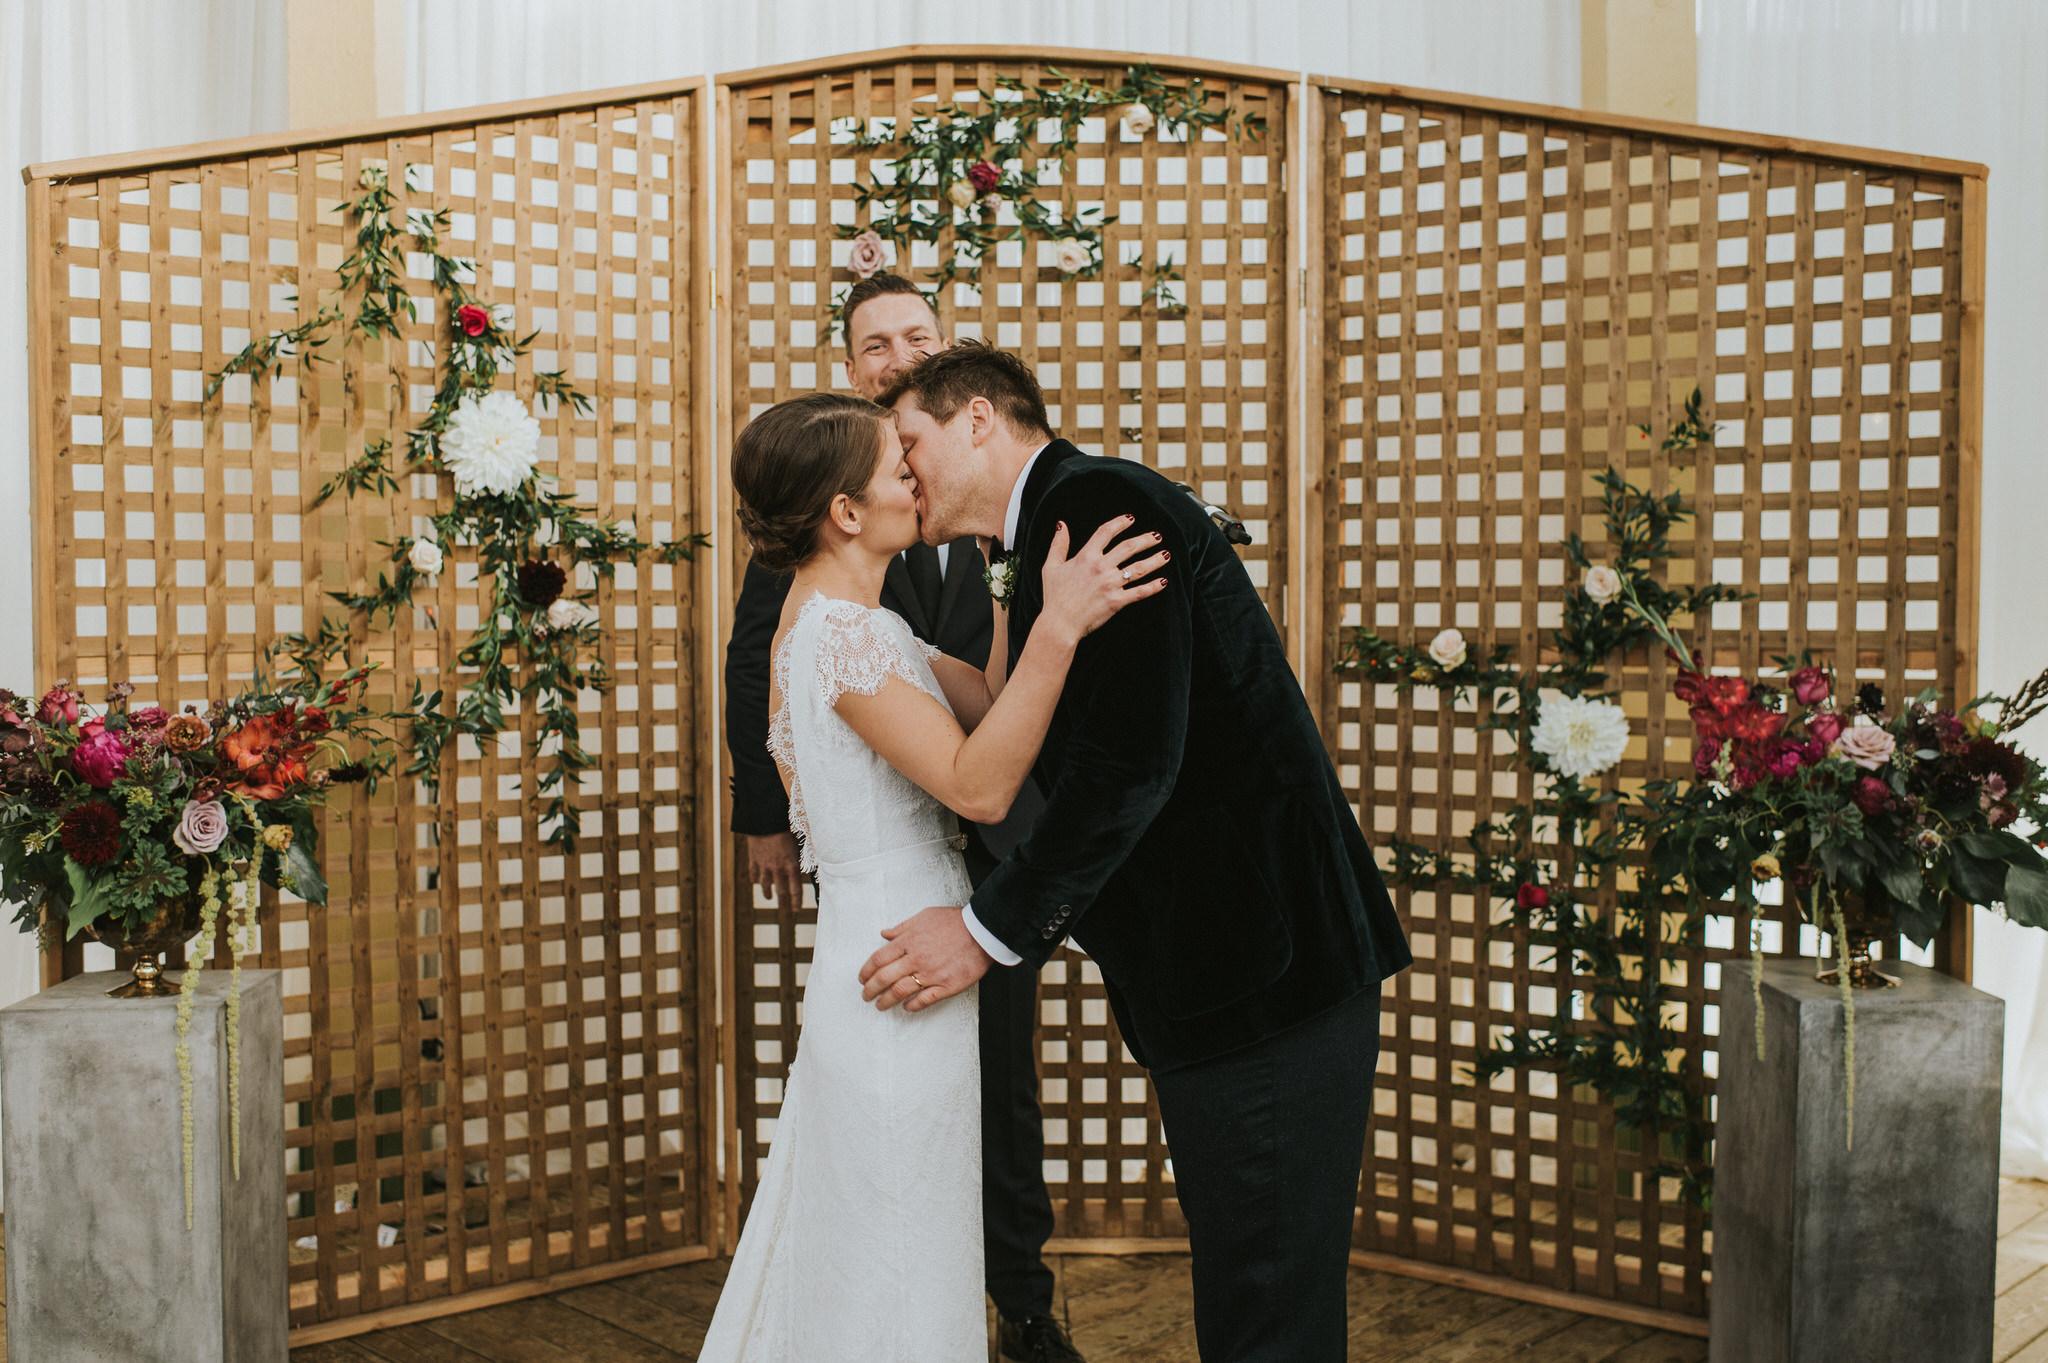 scarletoneillphotography_weddingphotography_prince edward county weddings119.JPG